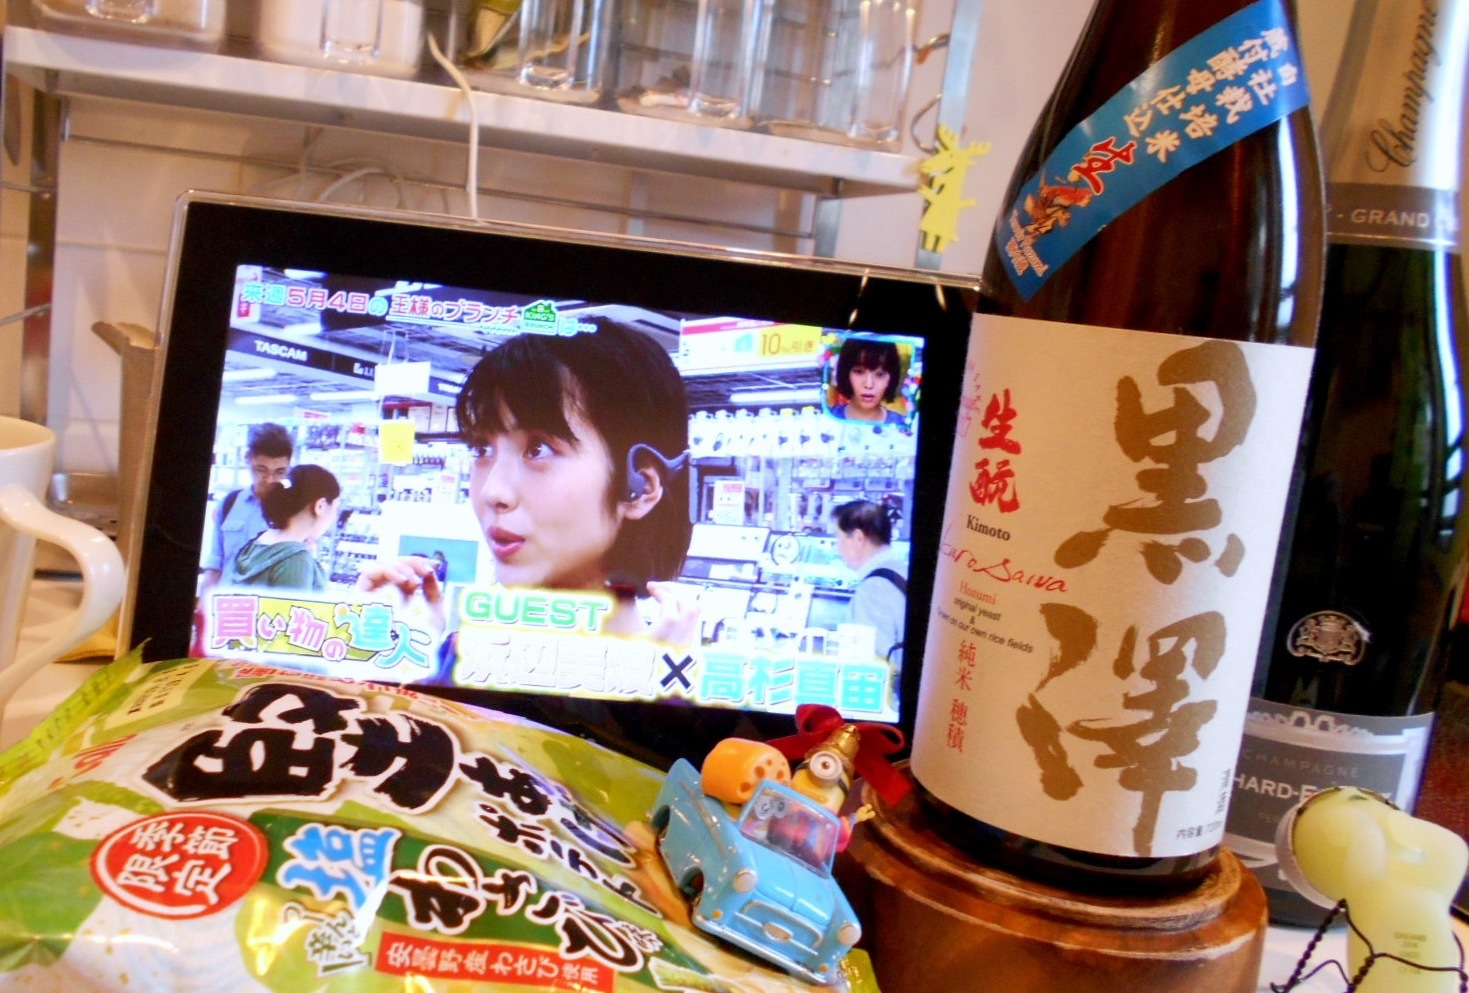 kurosawa_hozumi29by4_1.jpg